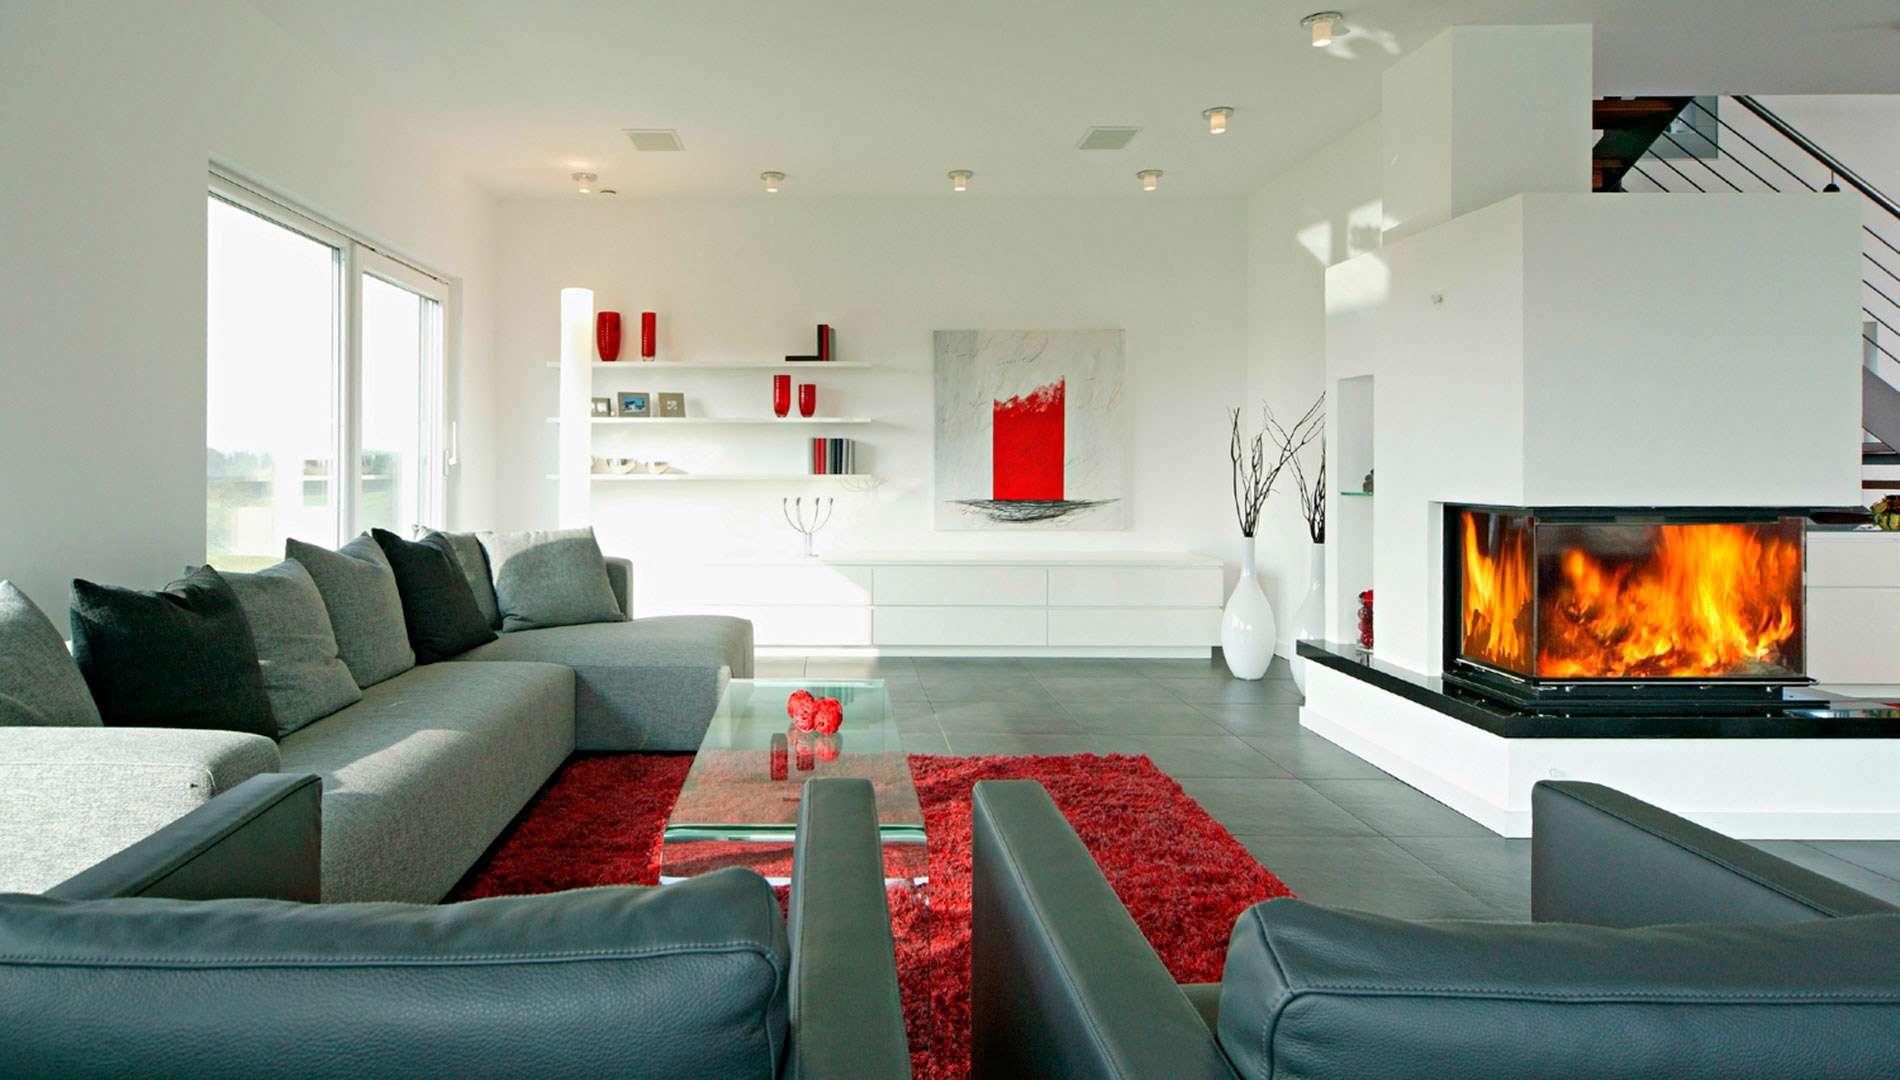 Musterhaus STYLE - Wohnzimmer